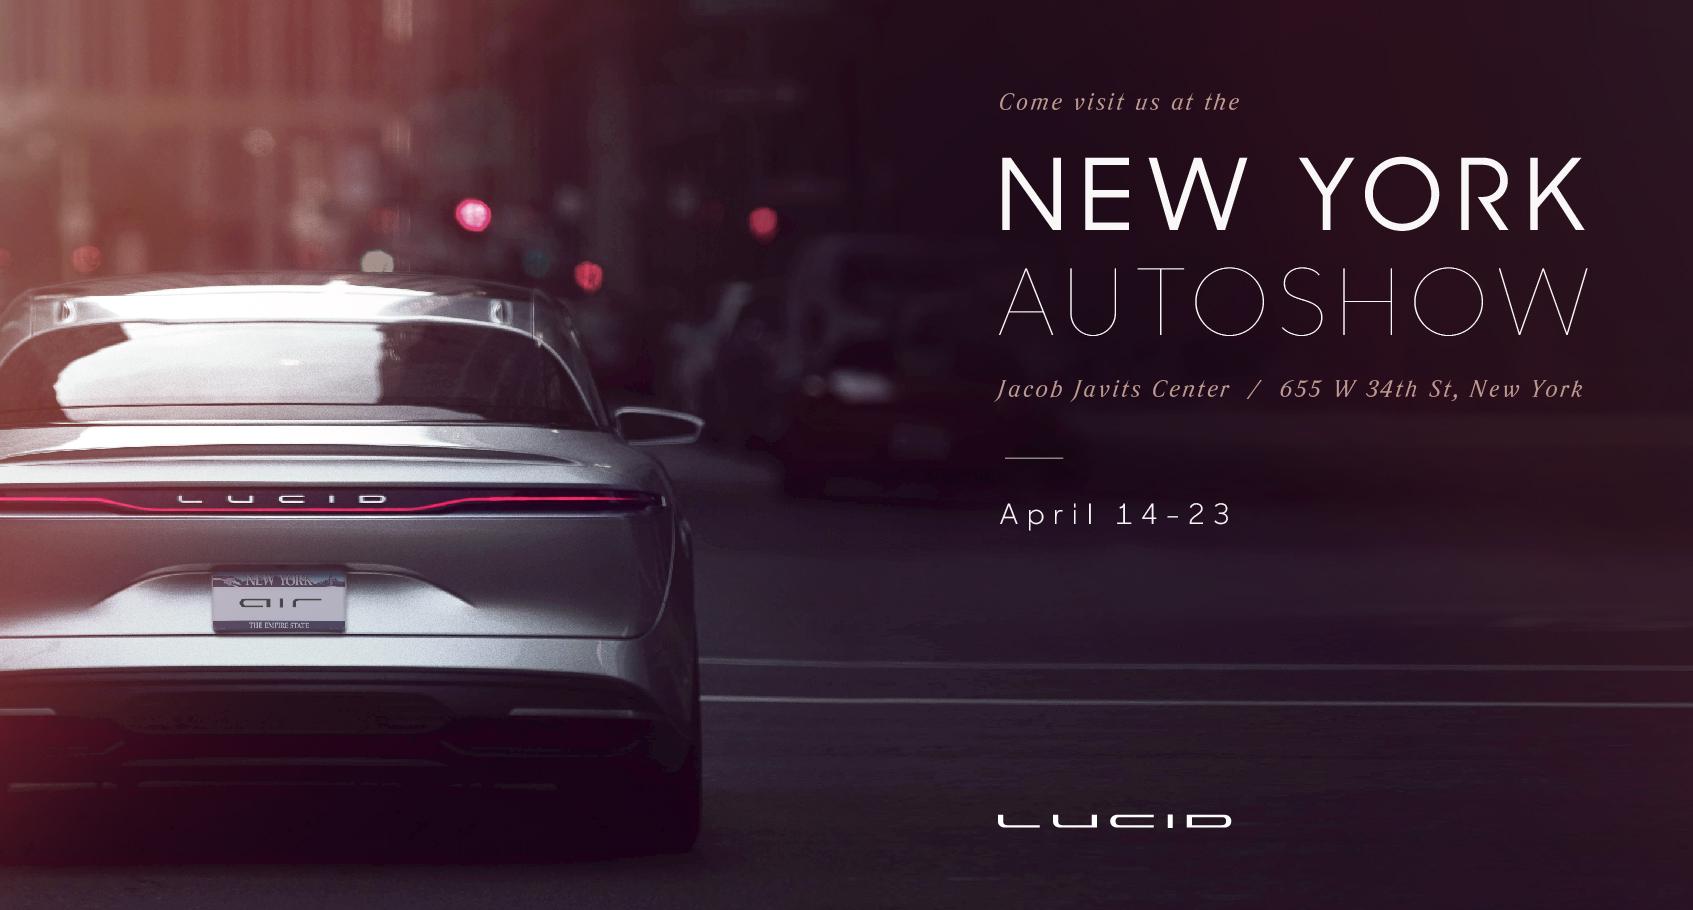 ny-auto-show-announcement